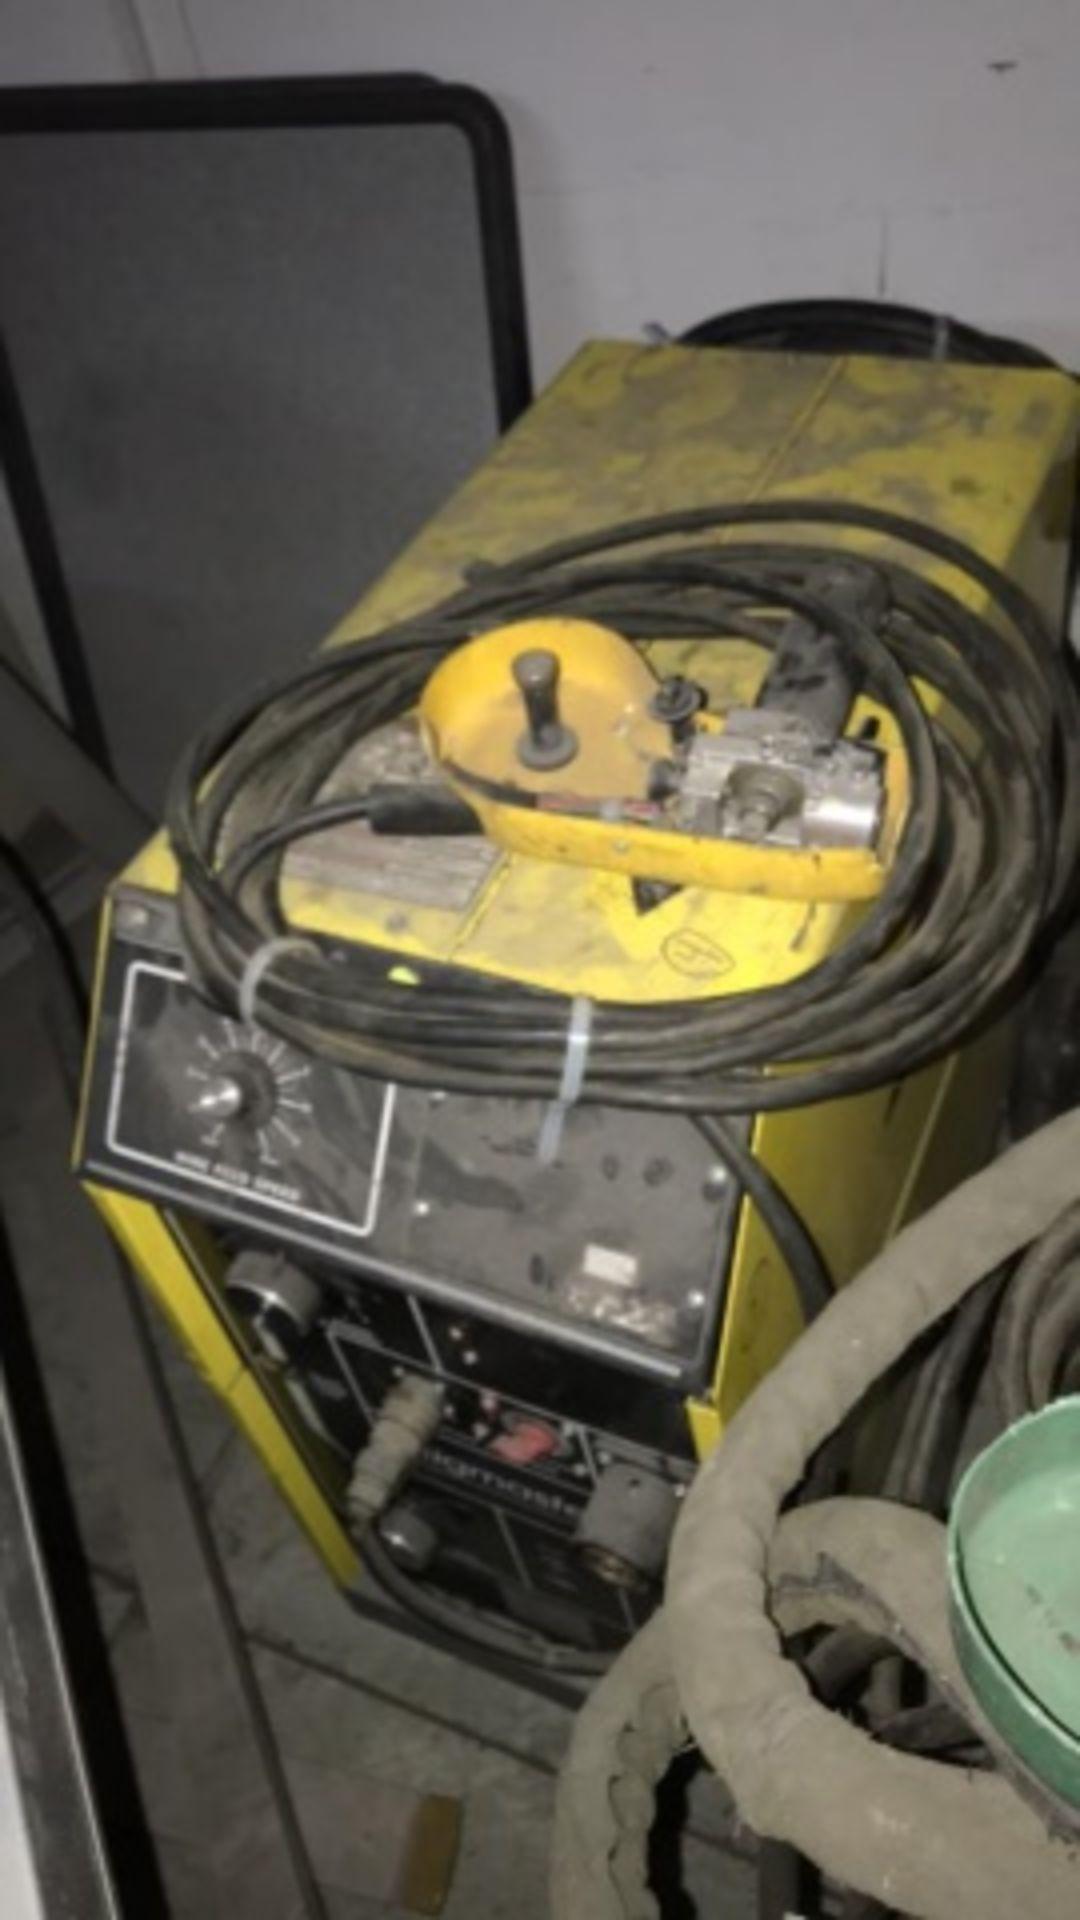 ESAB Migmaster 250 mig welder - Image 3 of 3